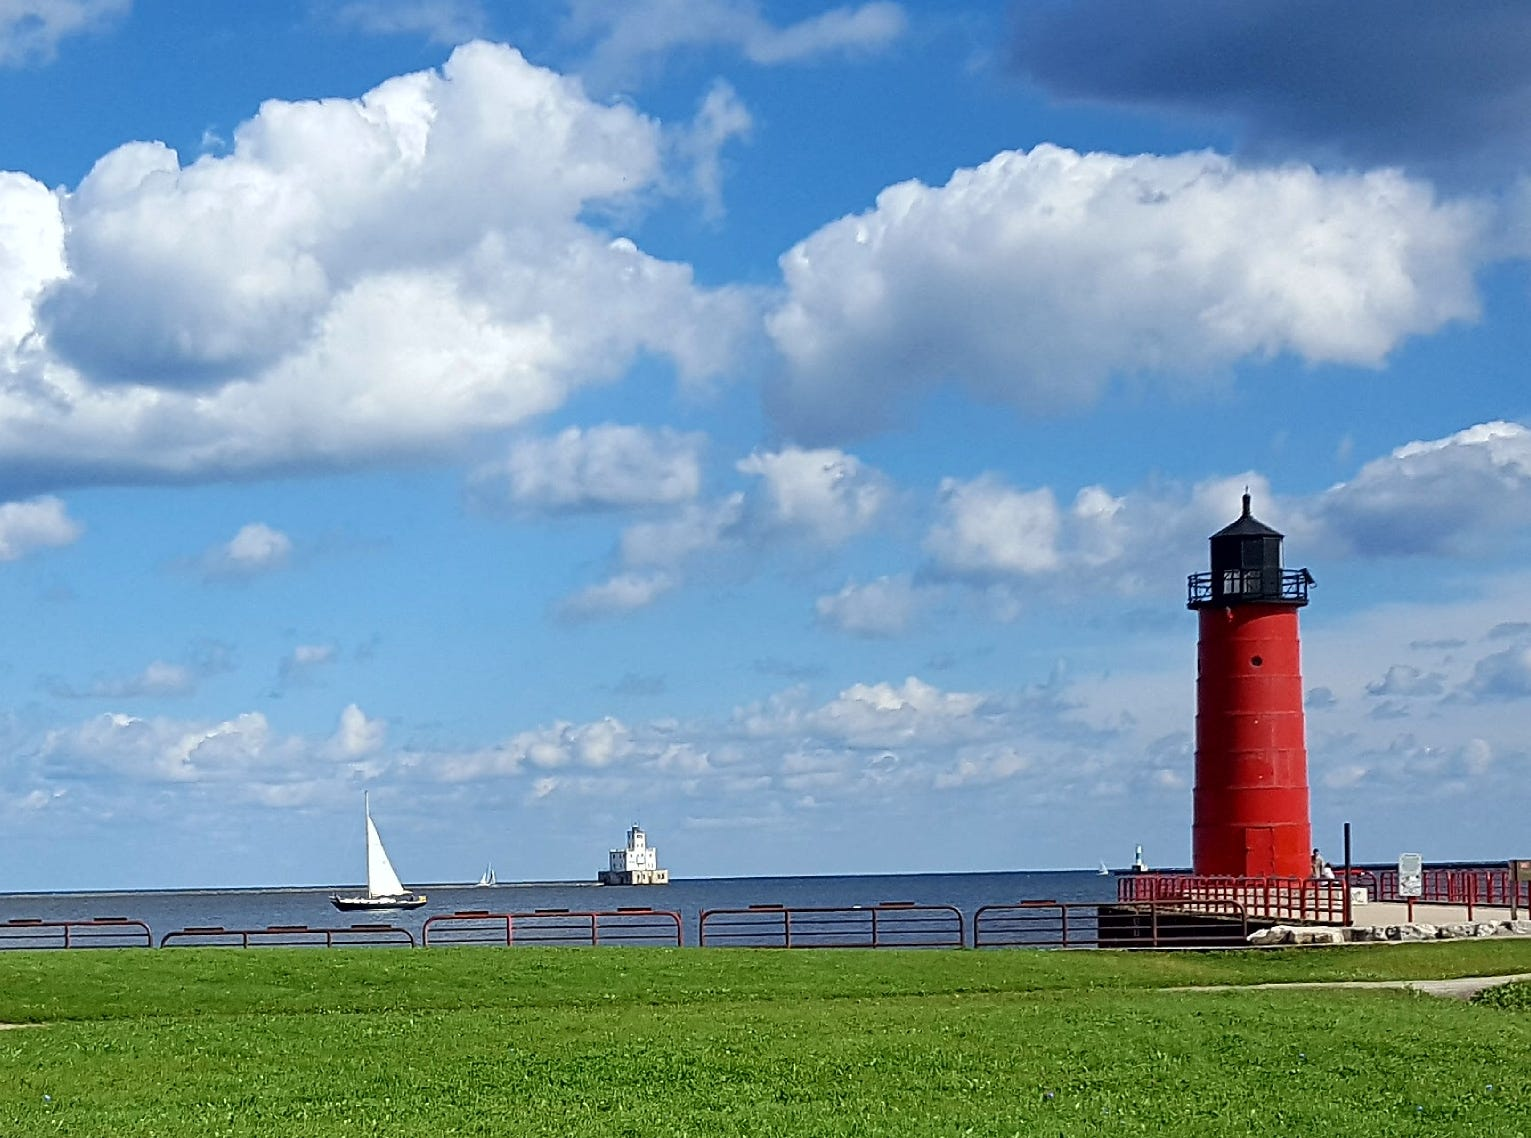 Confluence of the Kinnickinnic River and Lake Michigan, Milwaukee.